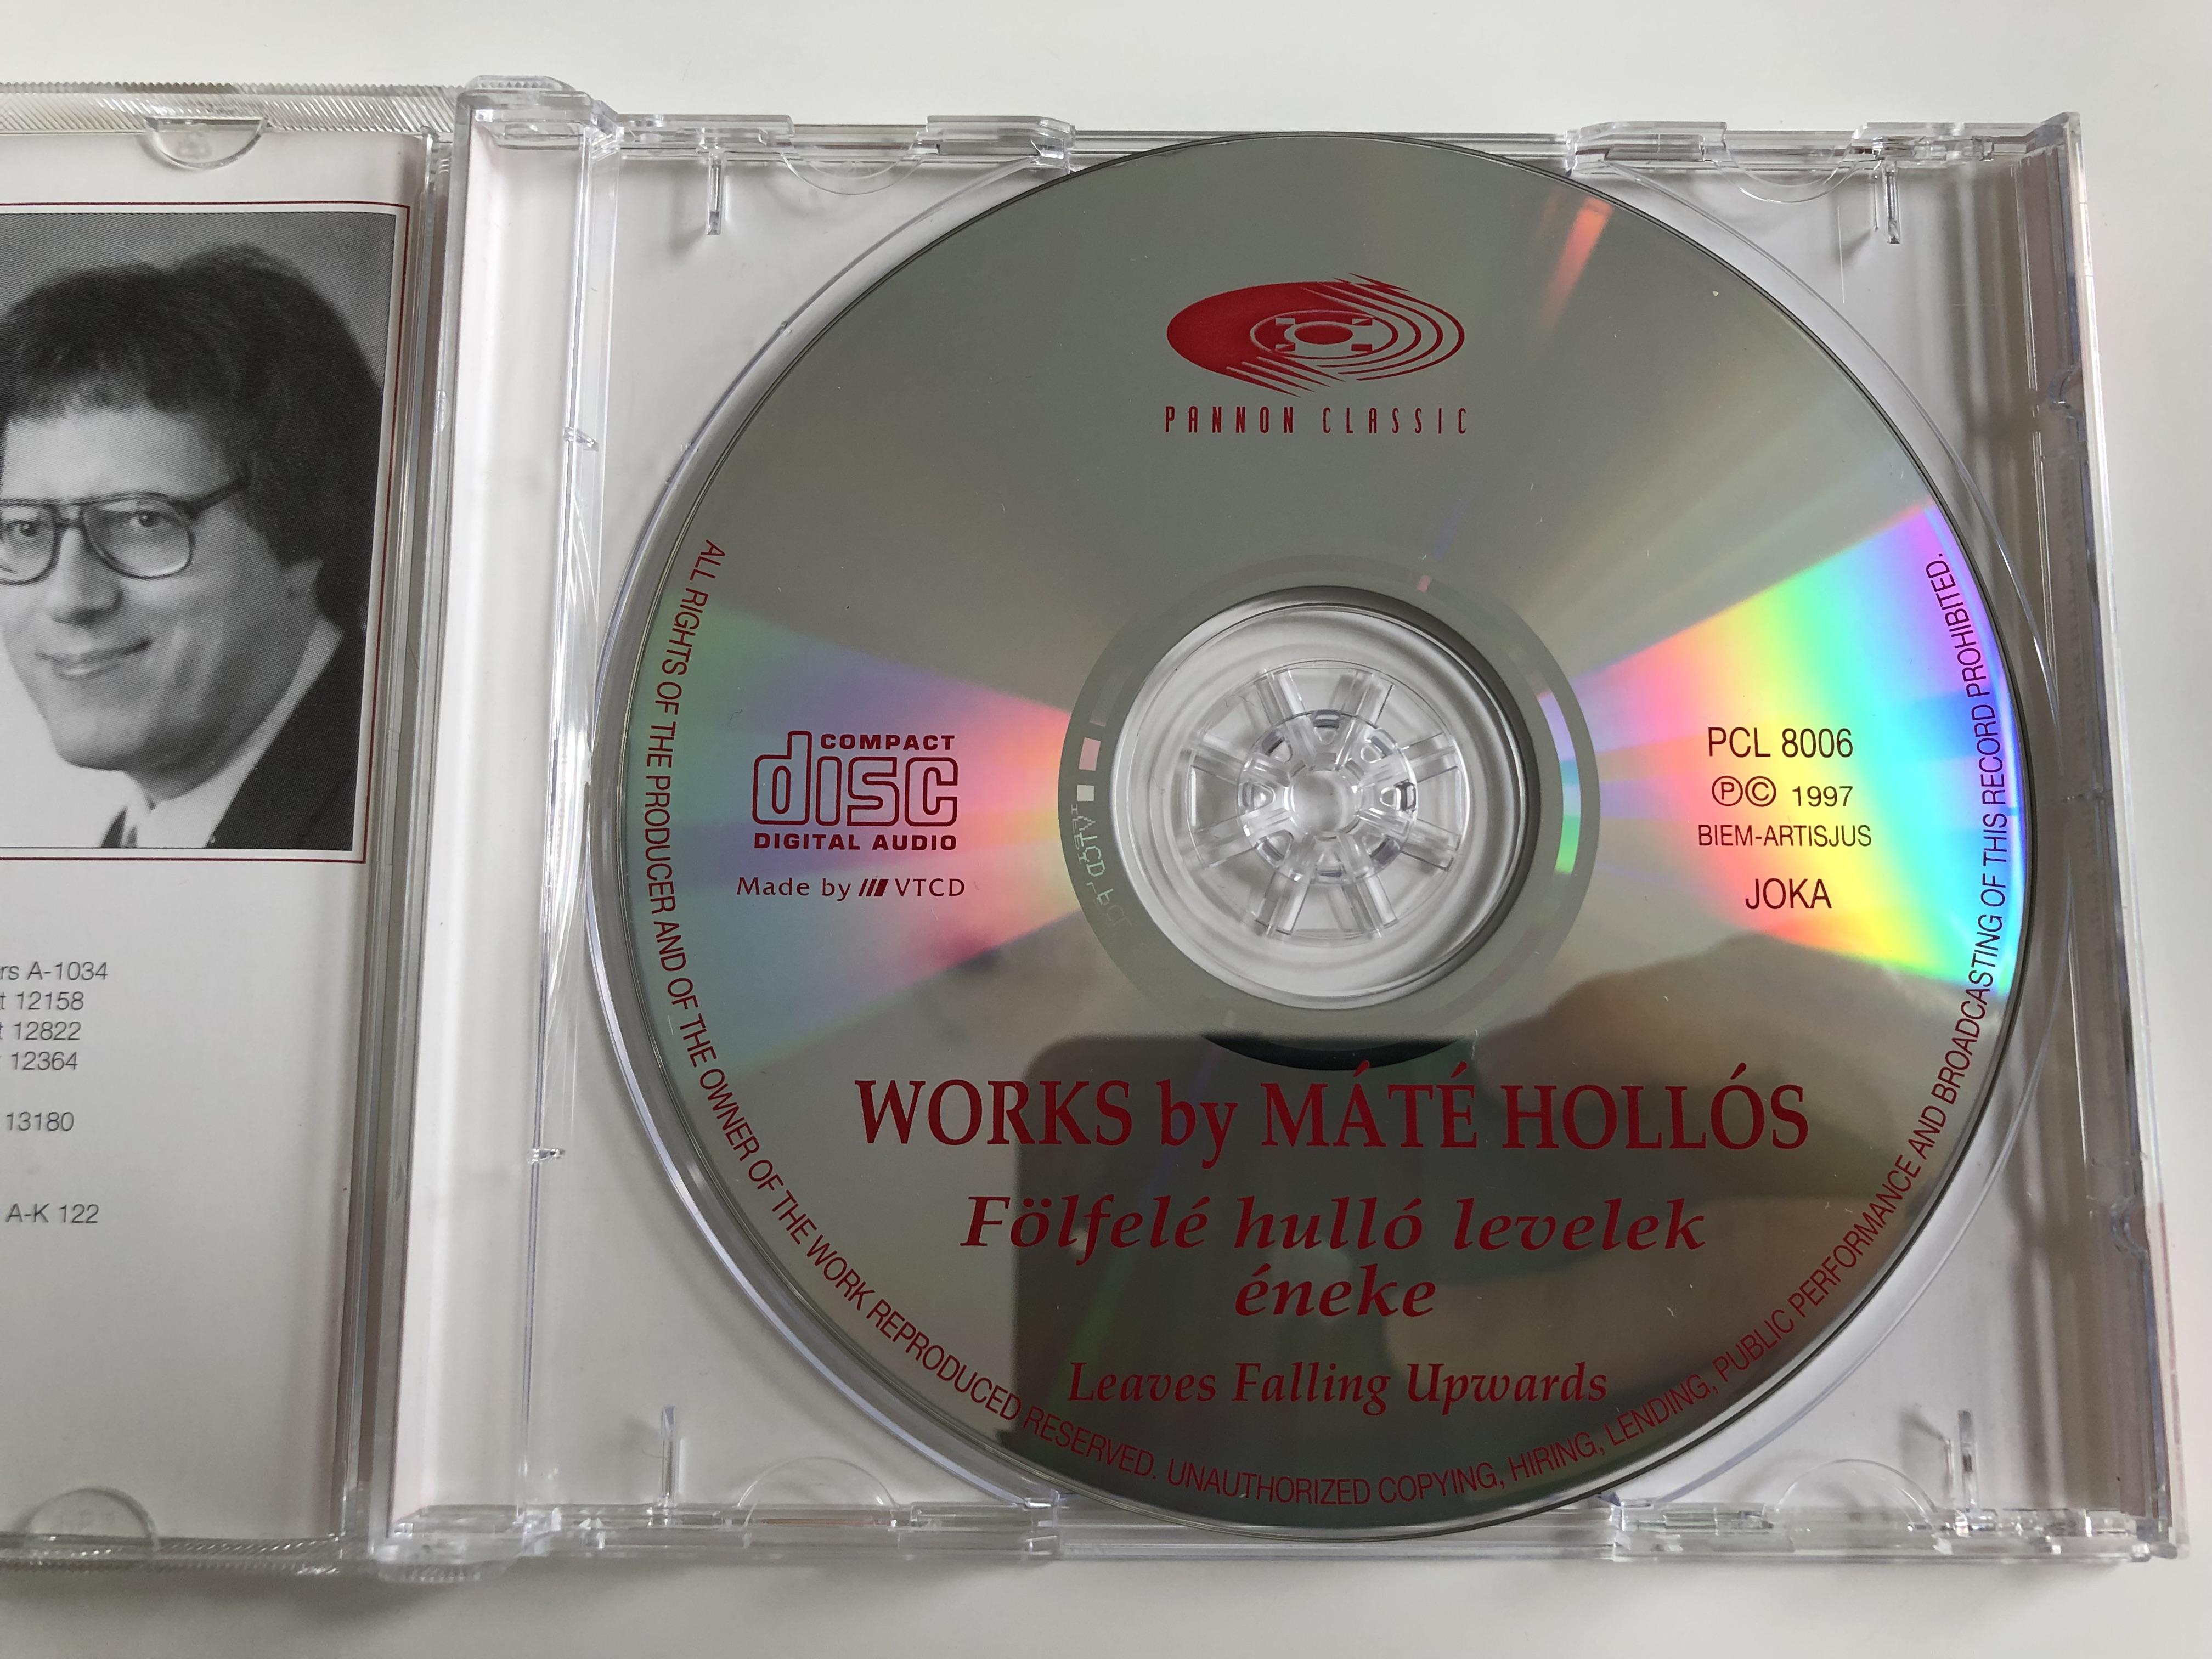 works-by-mate-hollos-folfele-hullo-levelek-eneke-leaves-falling-upwards-pannon-classic-audio-cd-1997-pcl-8006-5-.jpg